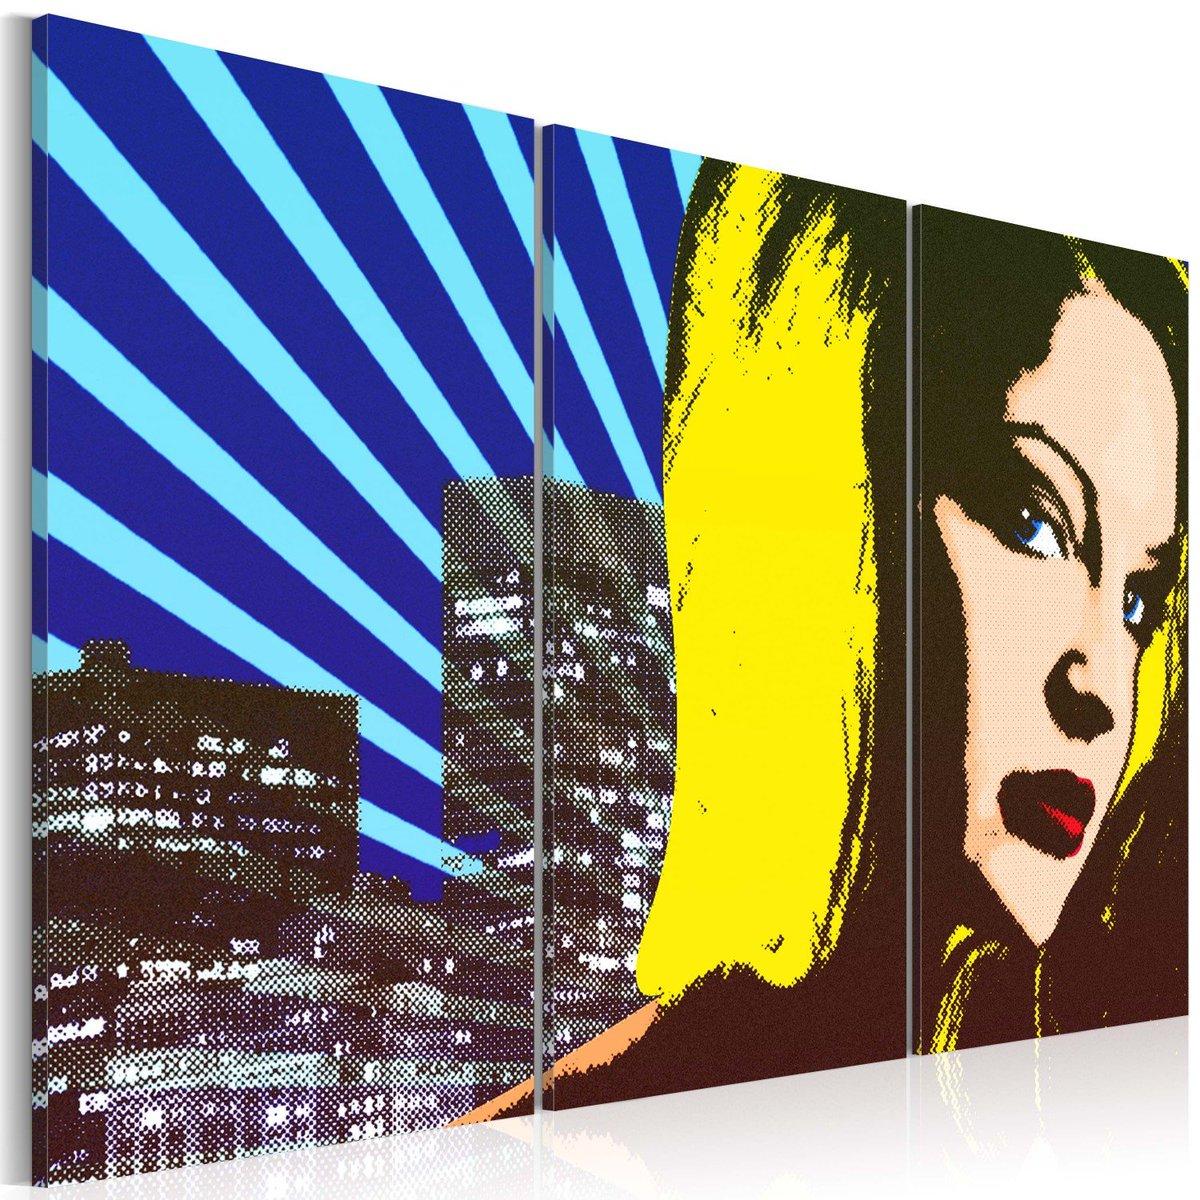 Quadro - sguardo - trittico, €99.99 https://goo.gl/f2Ksx2#art #tela #quadri #quadro #instadaily #iodecoro #cucine #streetart #artweet #offertavia @outfy  - Ukustom